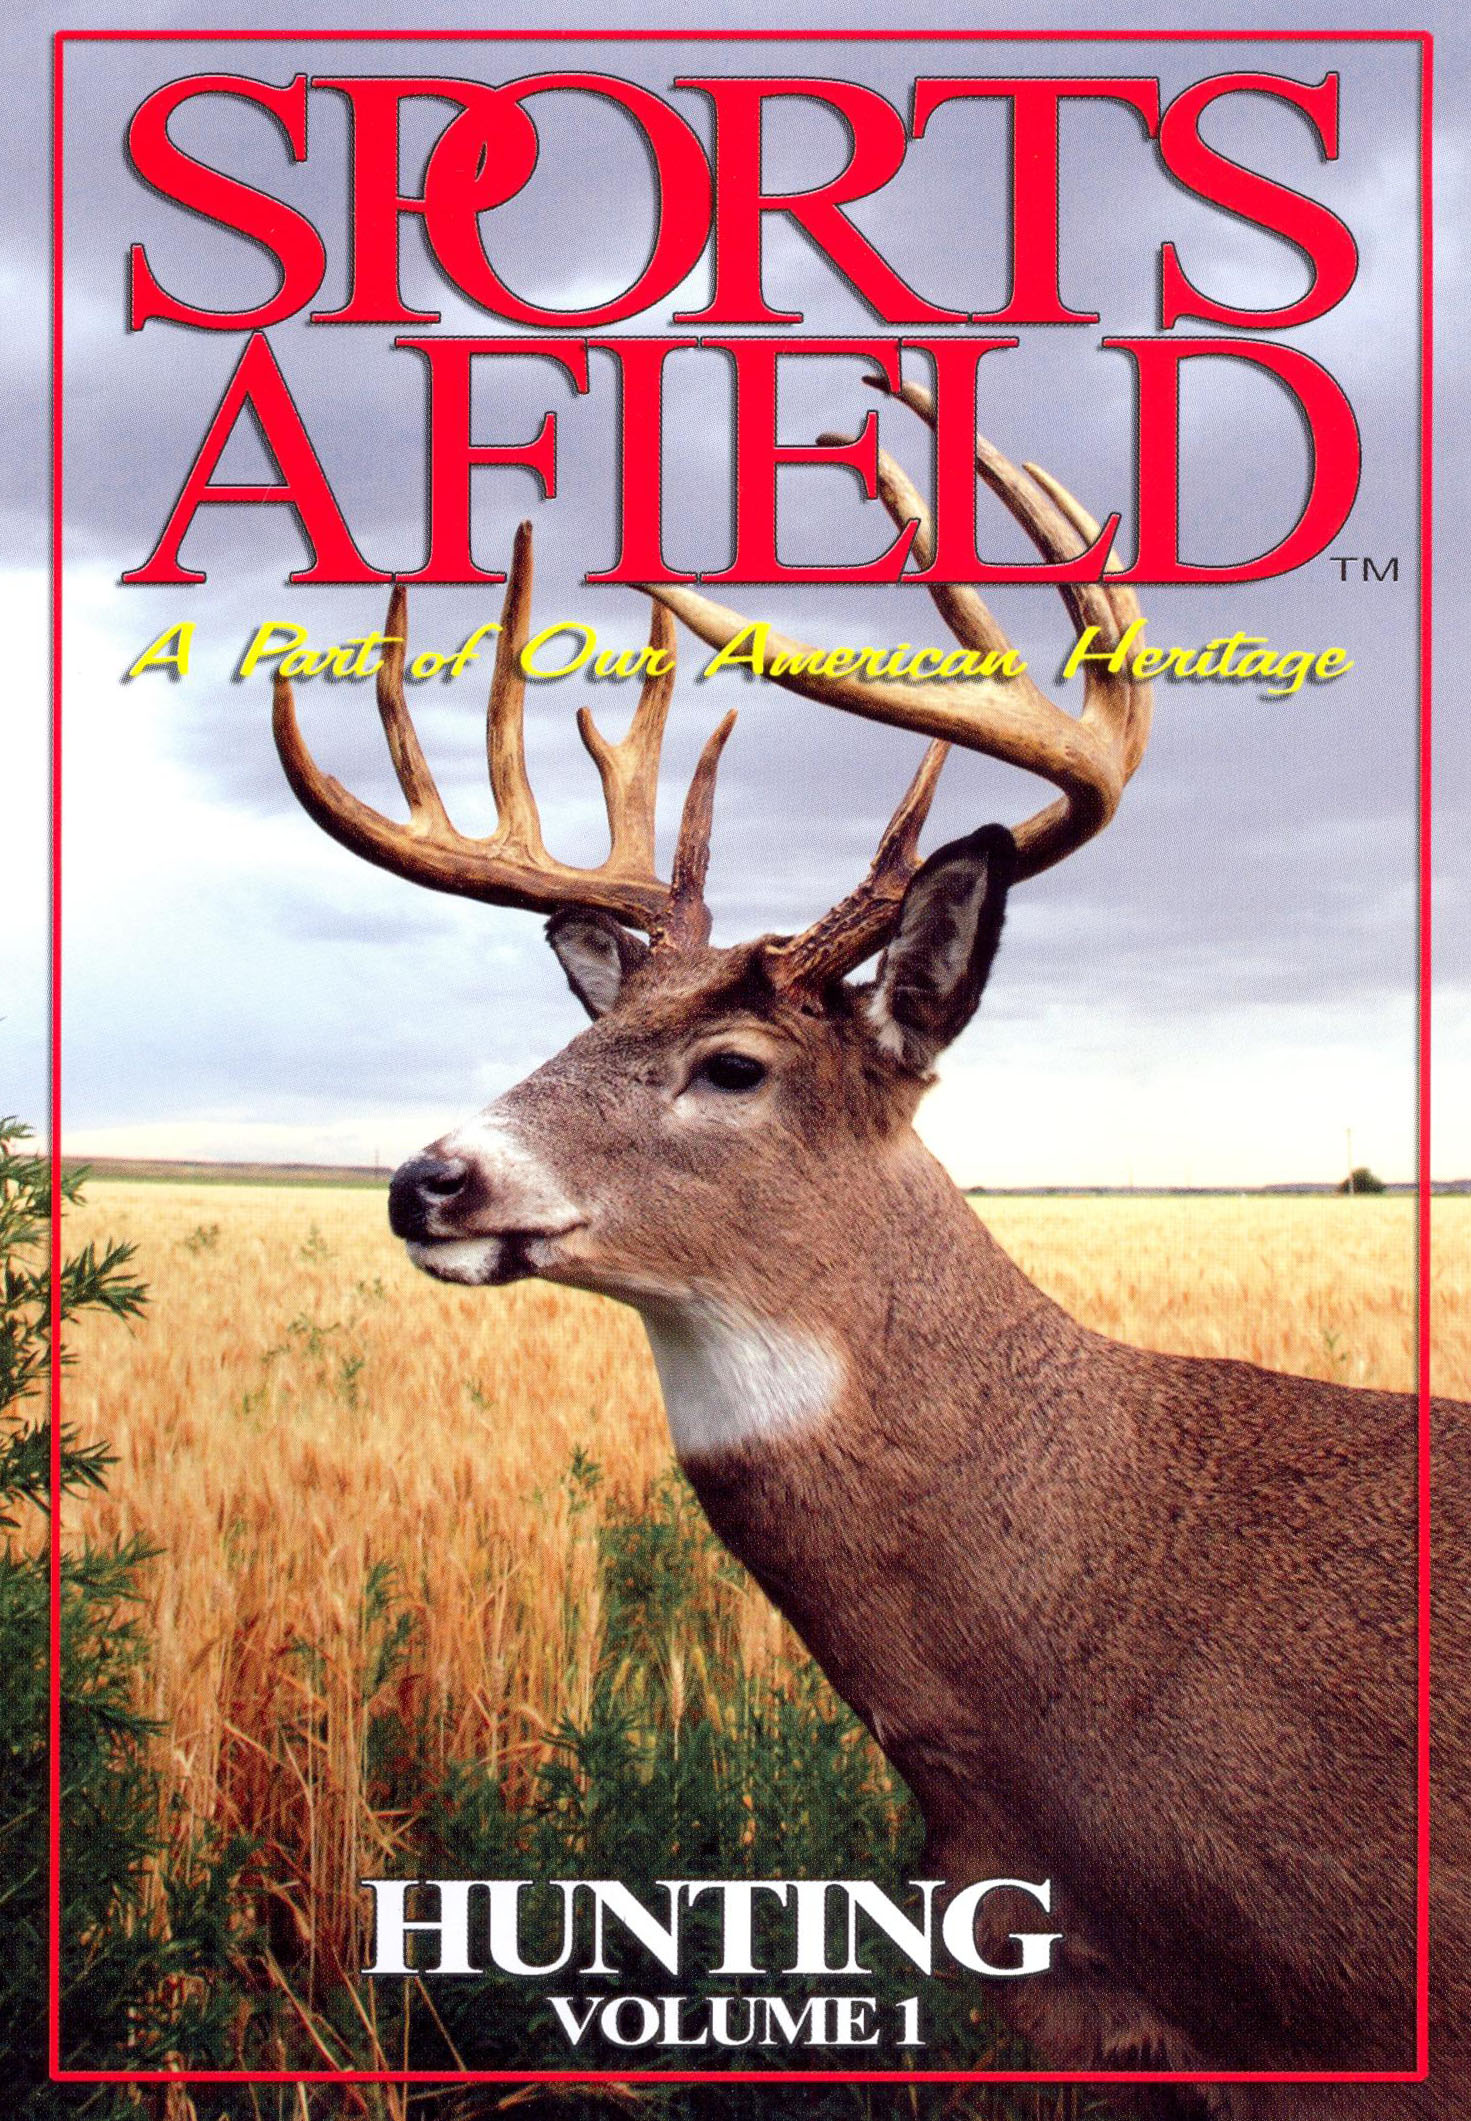 Sports Afield: Hunting